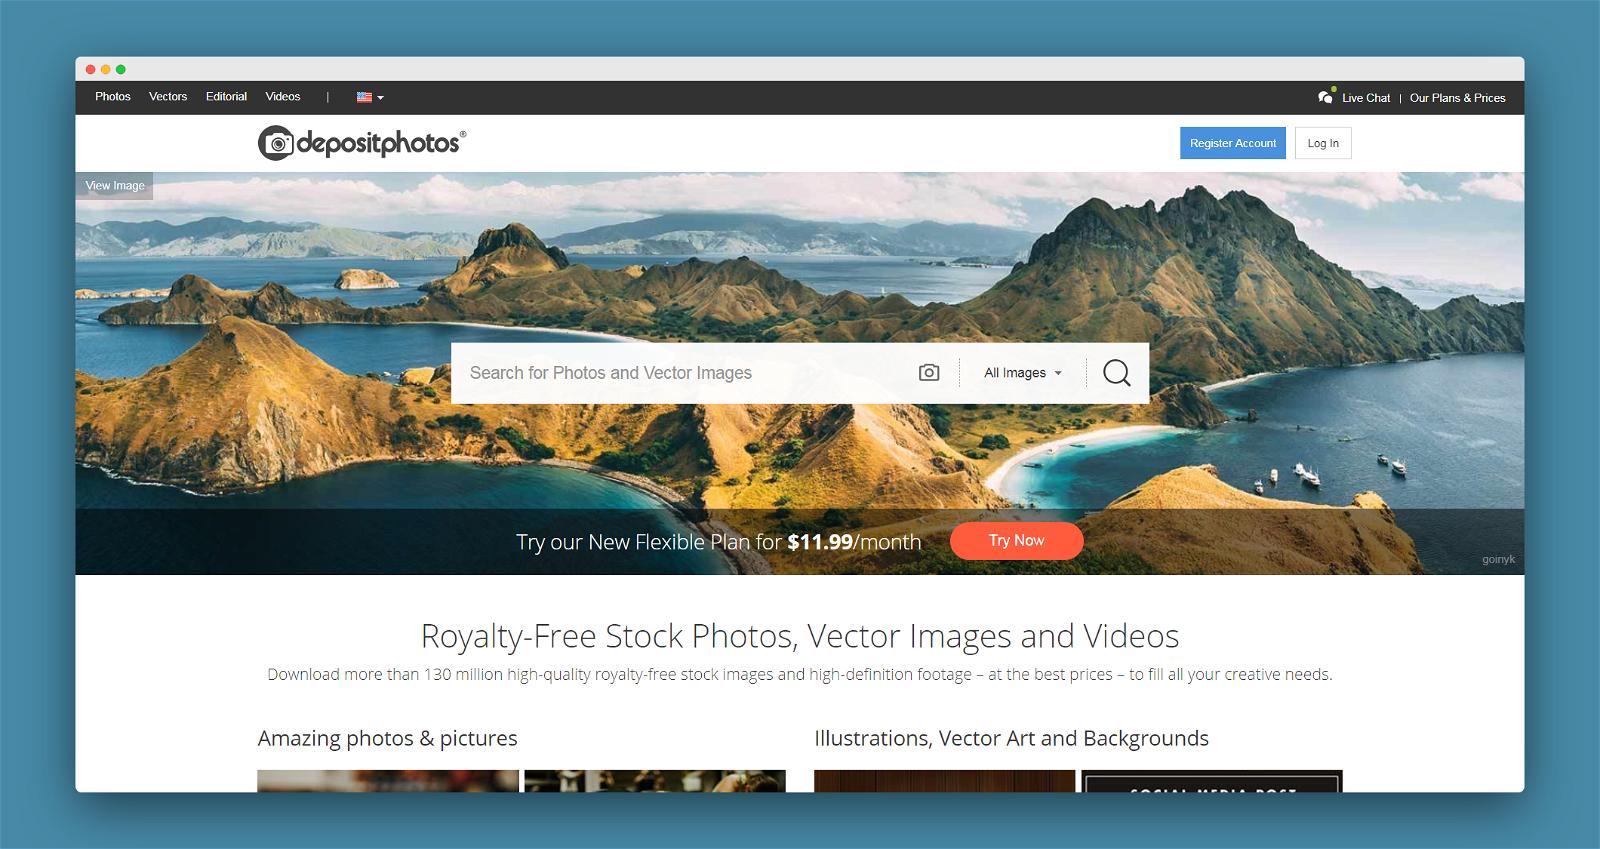 Deposit Photos Screenshot 1